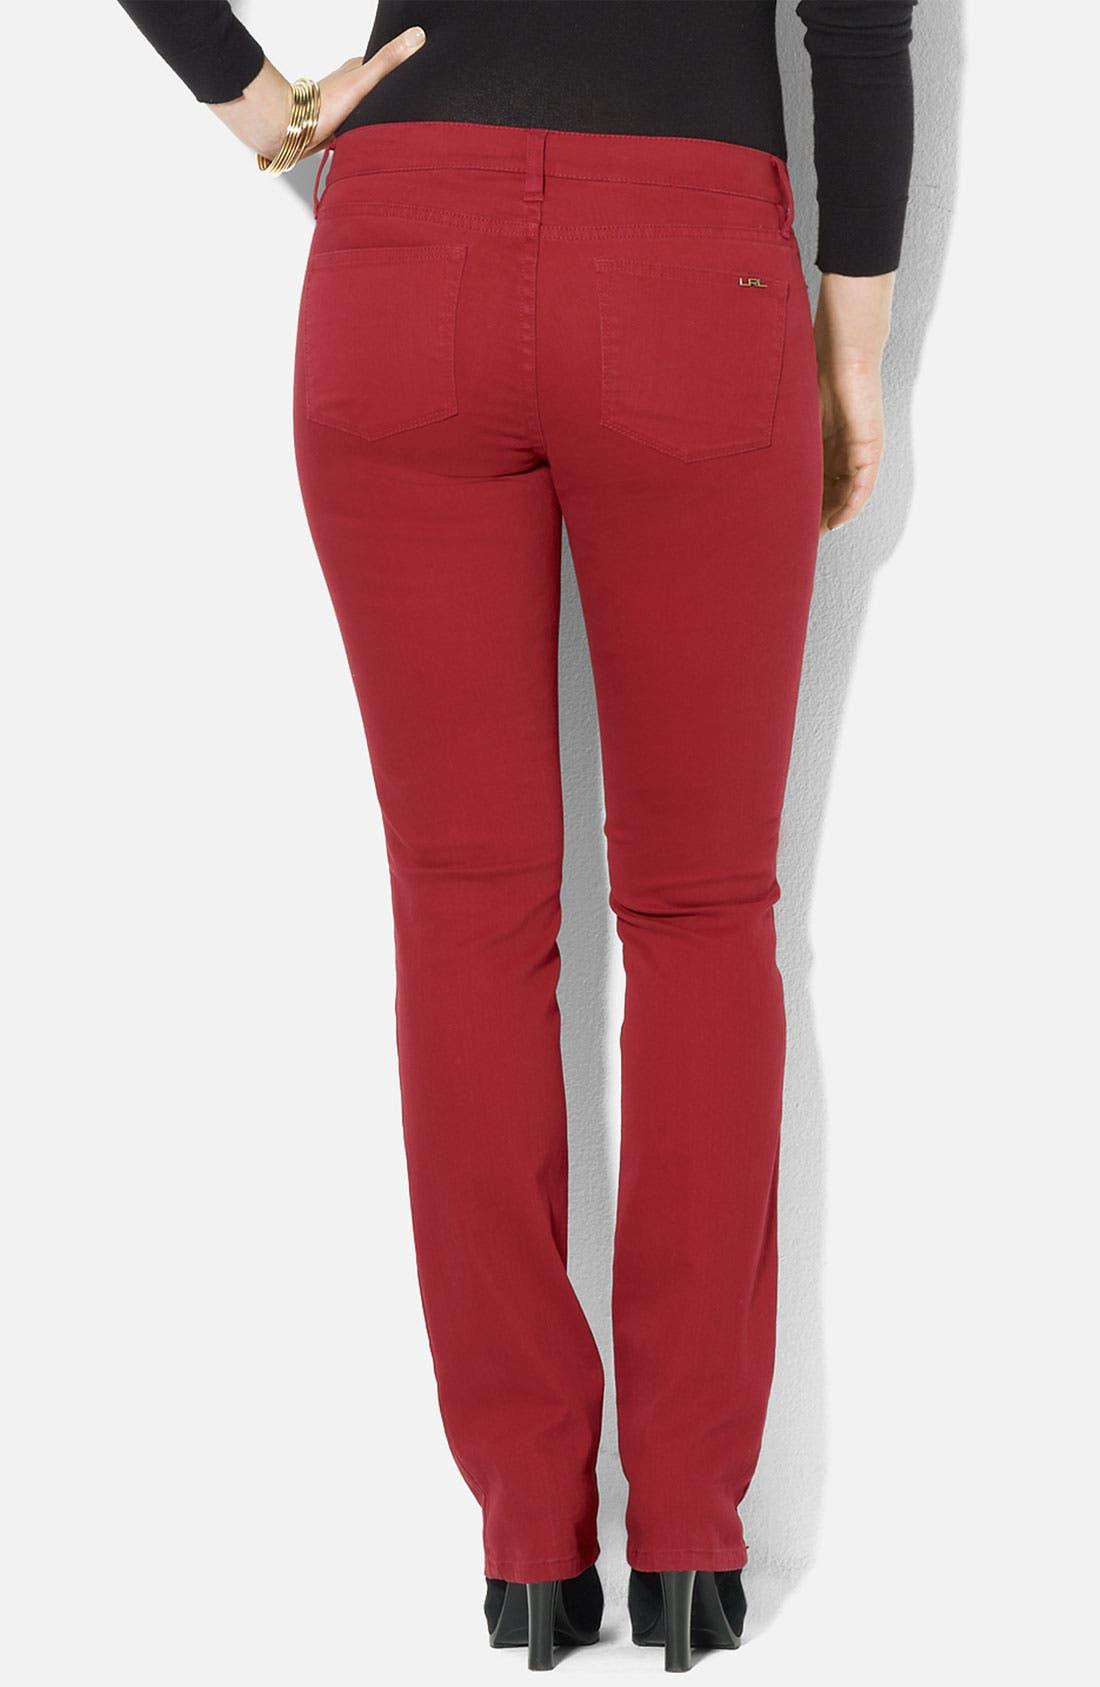 Alternate Image 2  - Lauren Ralph Lauren Slim Straight Leg Colored Jeans (Petite) (Online Exclusive)